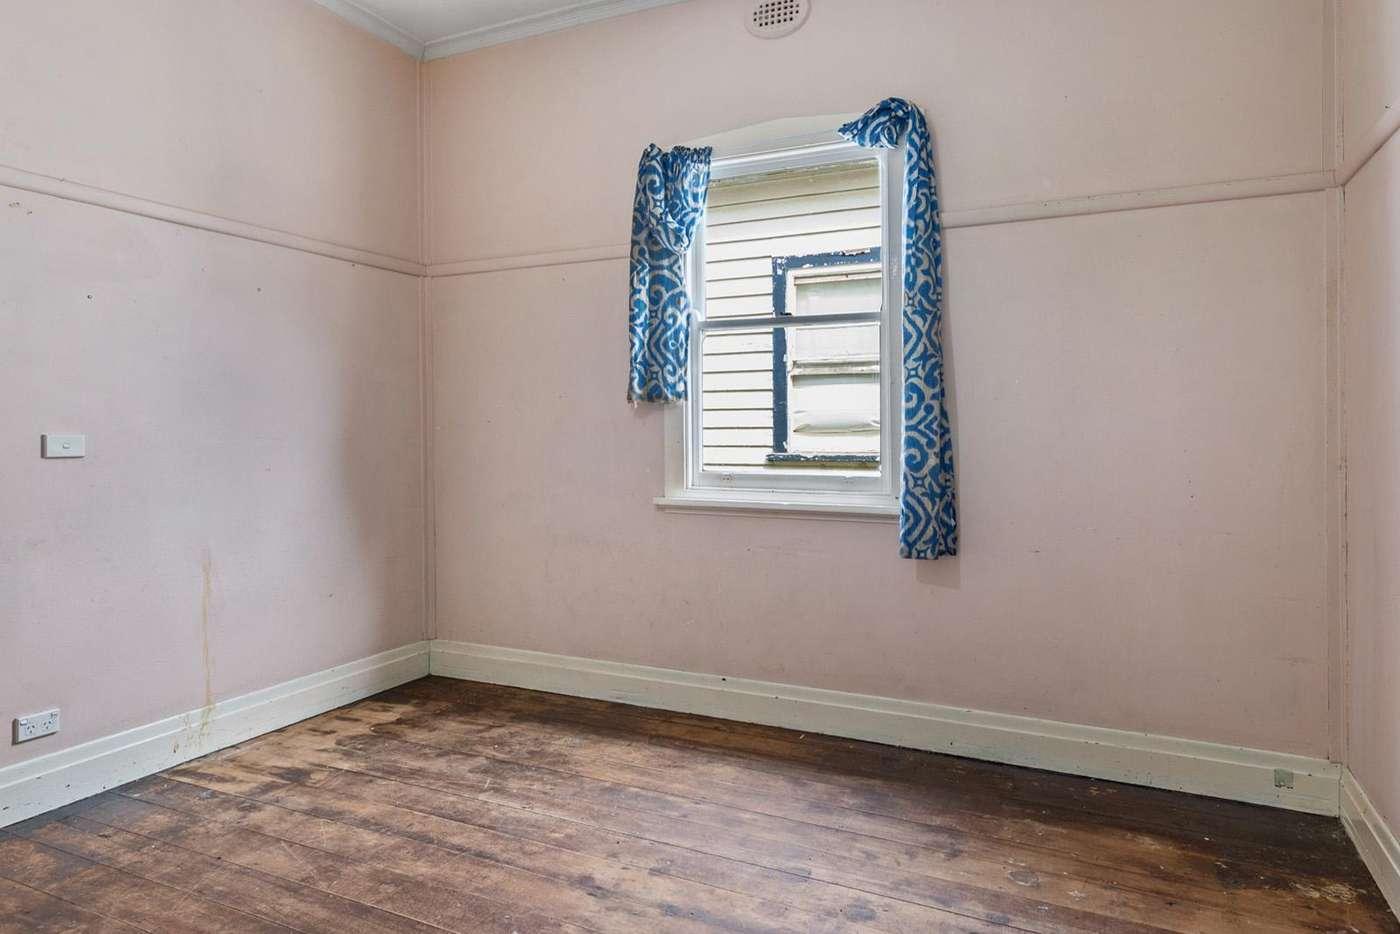 Seventh view of Homely house listing, 18 Albert Street, Sebastopol VIC 3356